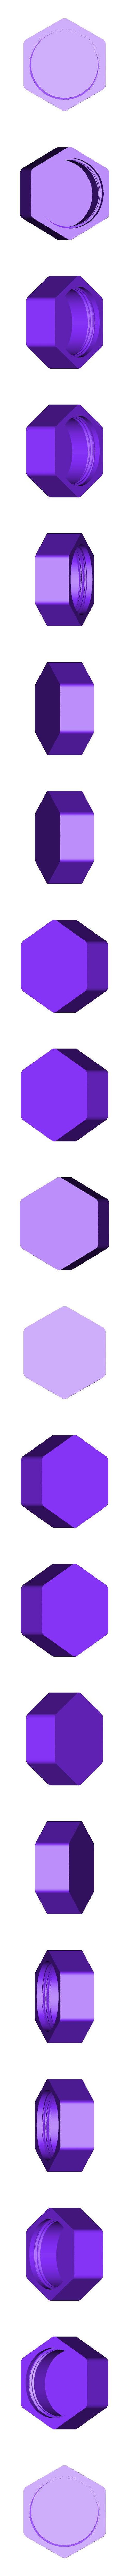 HexaPill - Container 1 section.stl Download STL file HexaPill - Modular pillbox / pill dispenser • 3D printing design, yozz